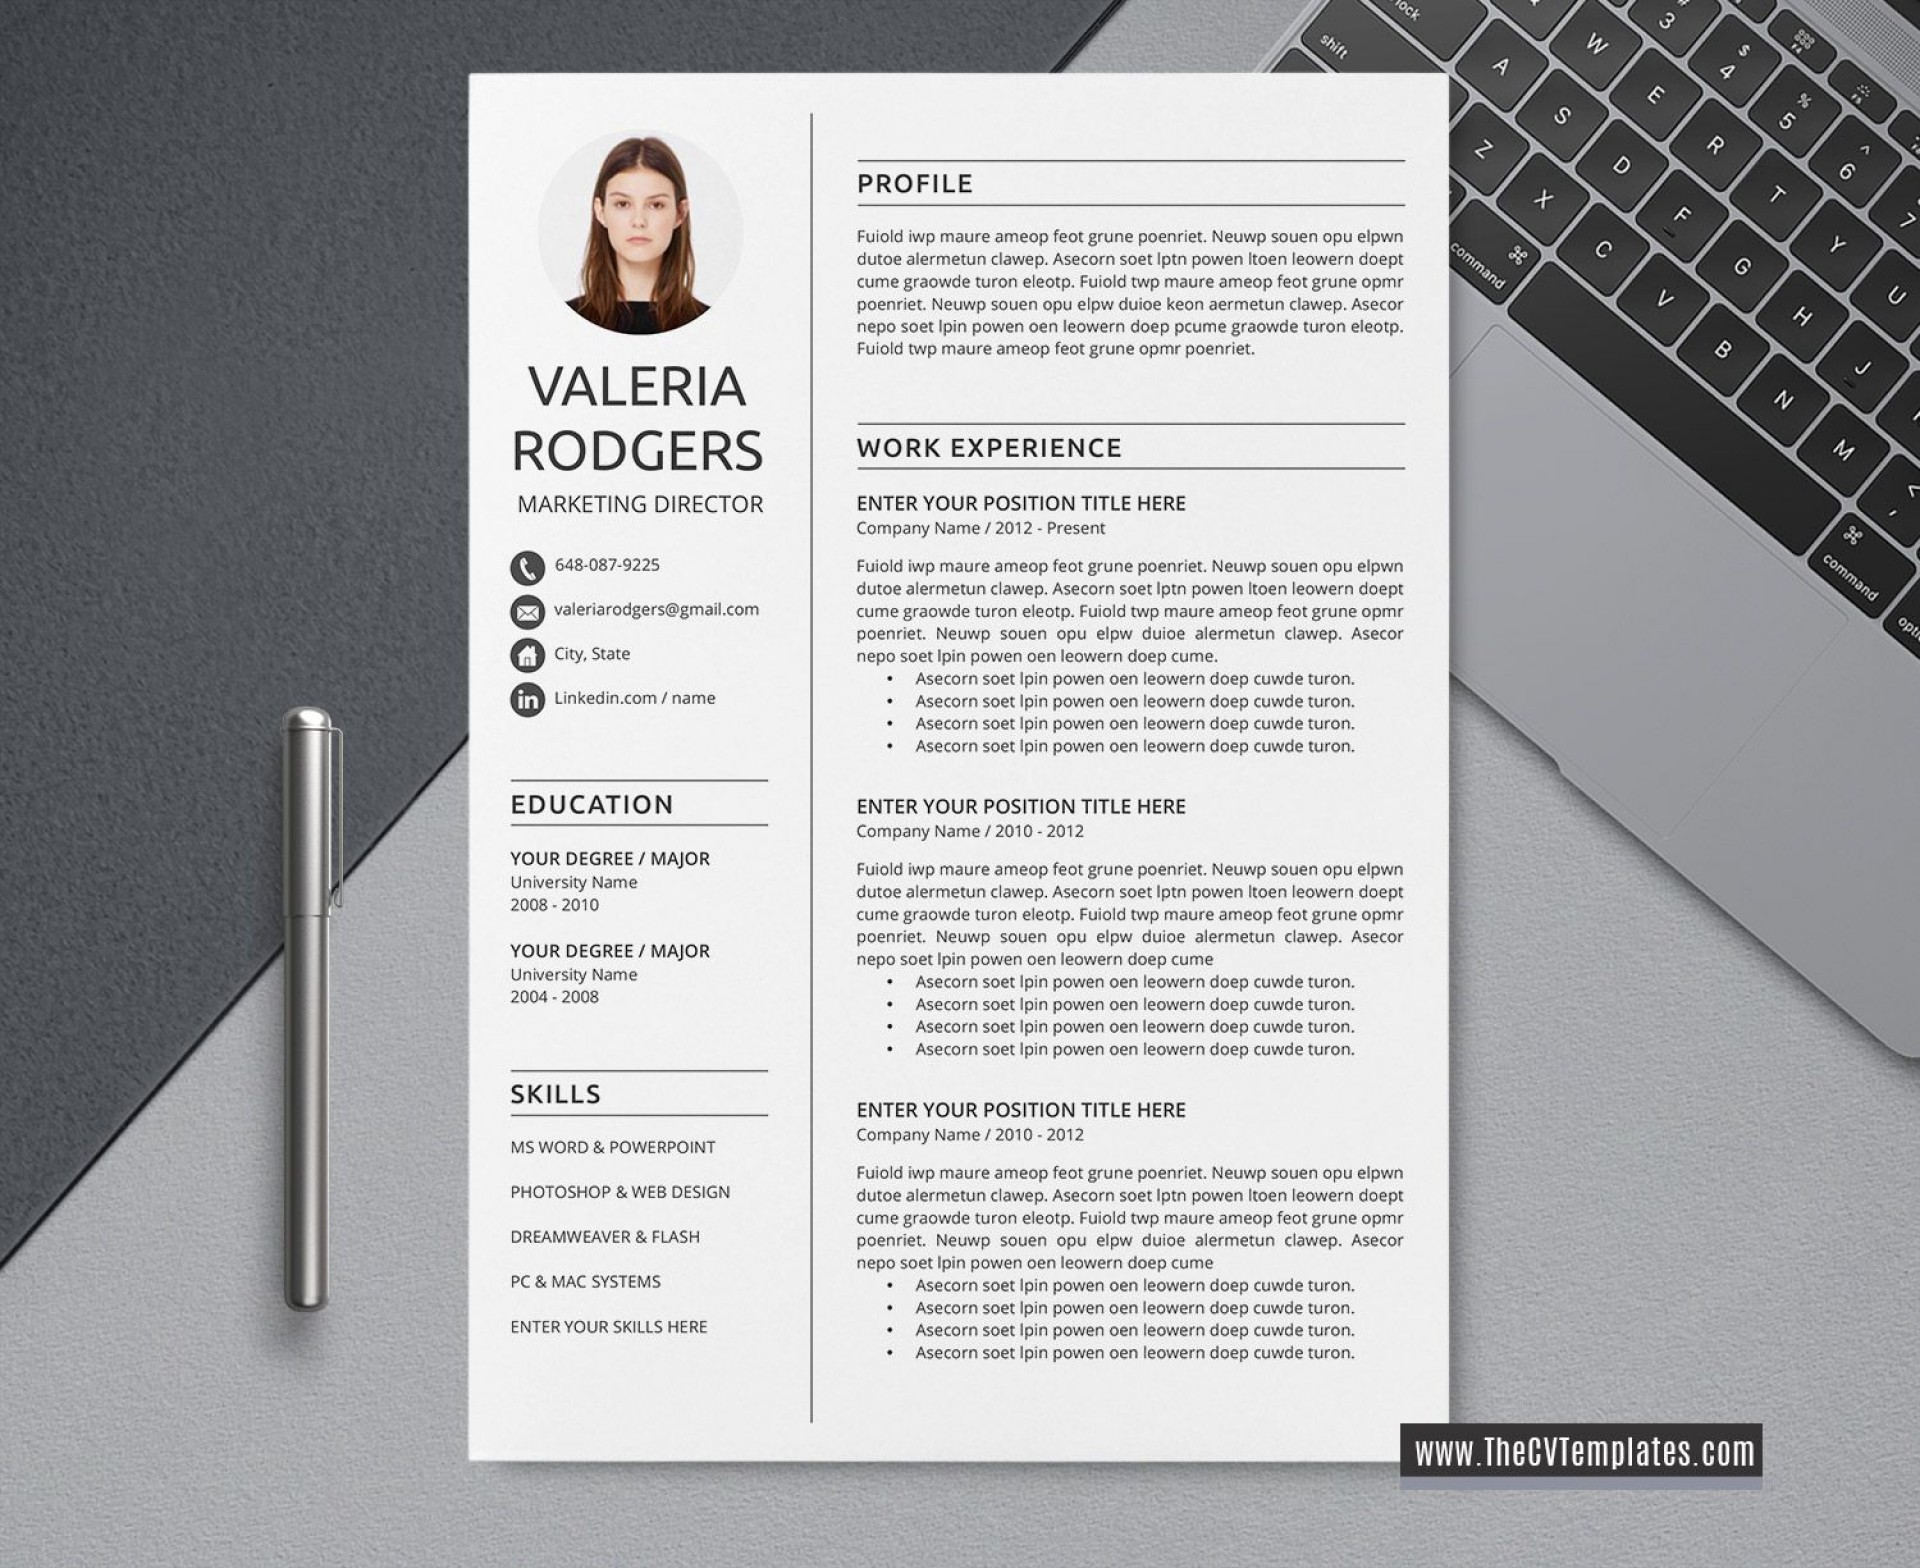 004 Simple Word Resume Template 2020 Image  Microsoft M1920